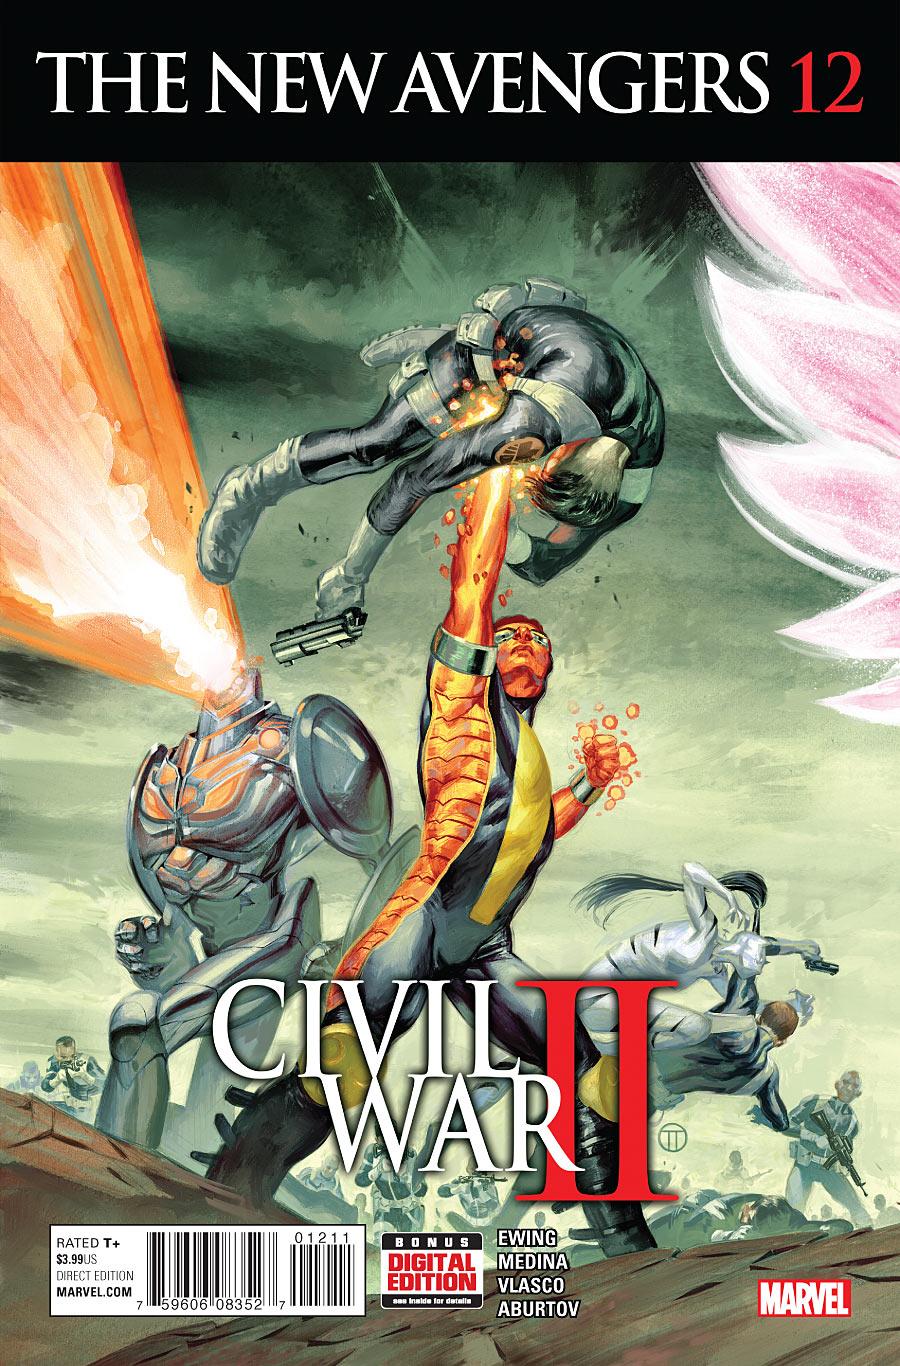 The New Avengers #12